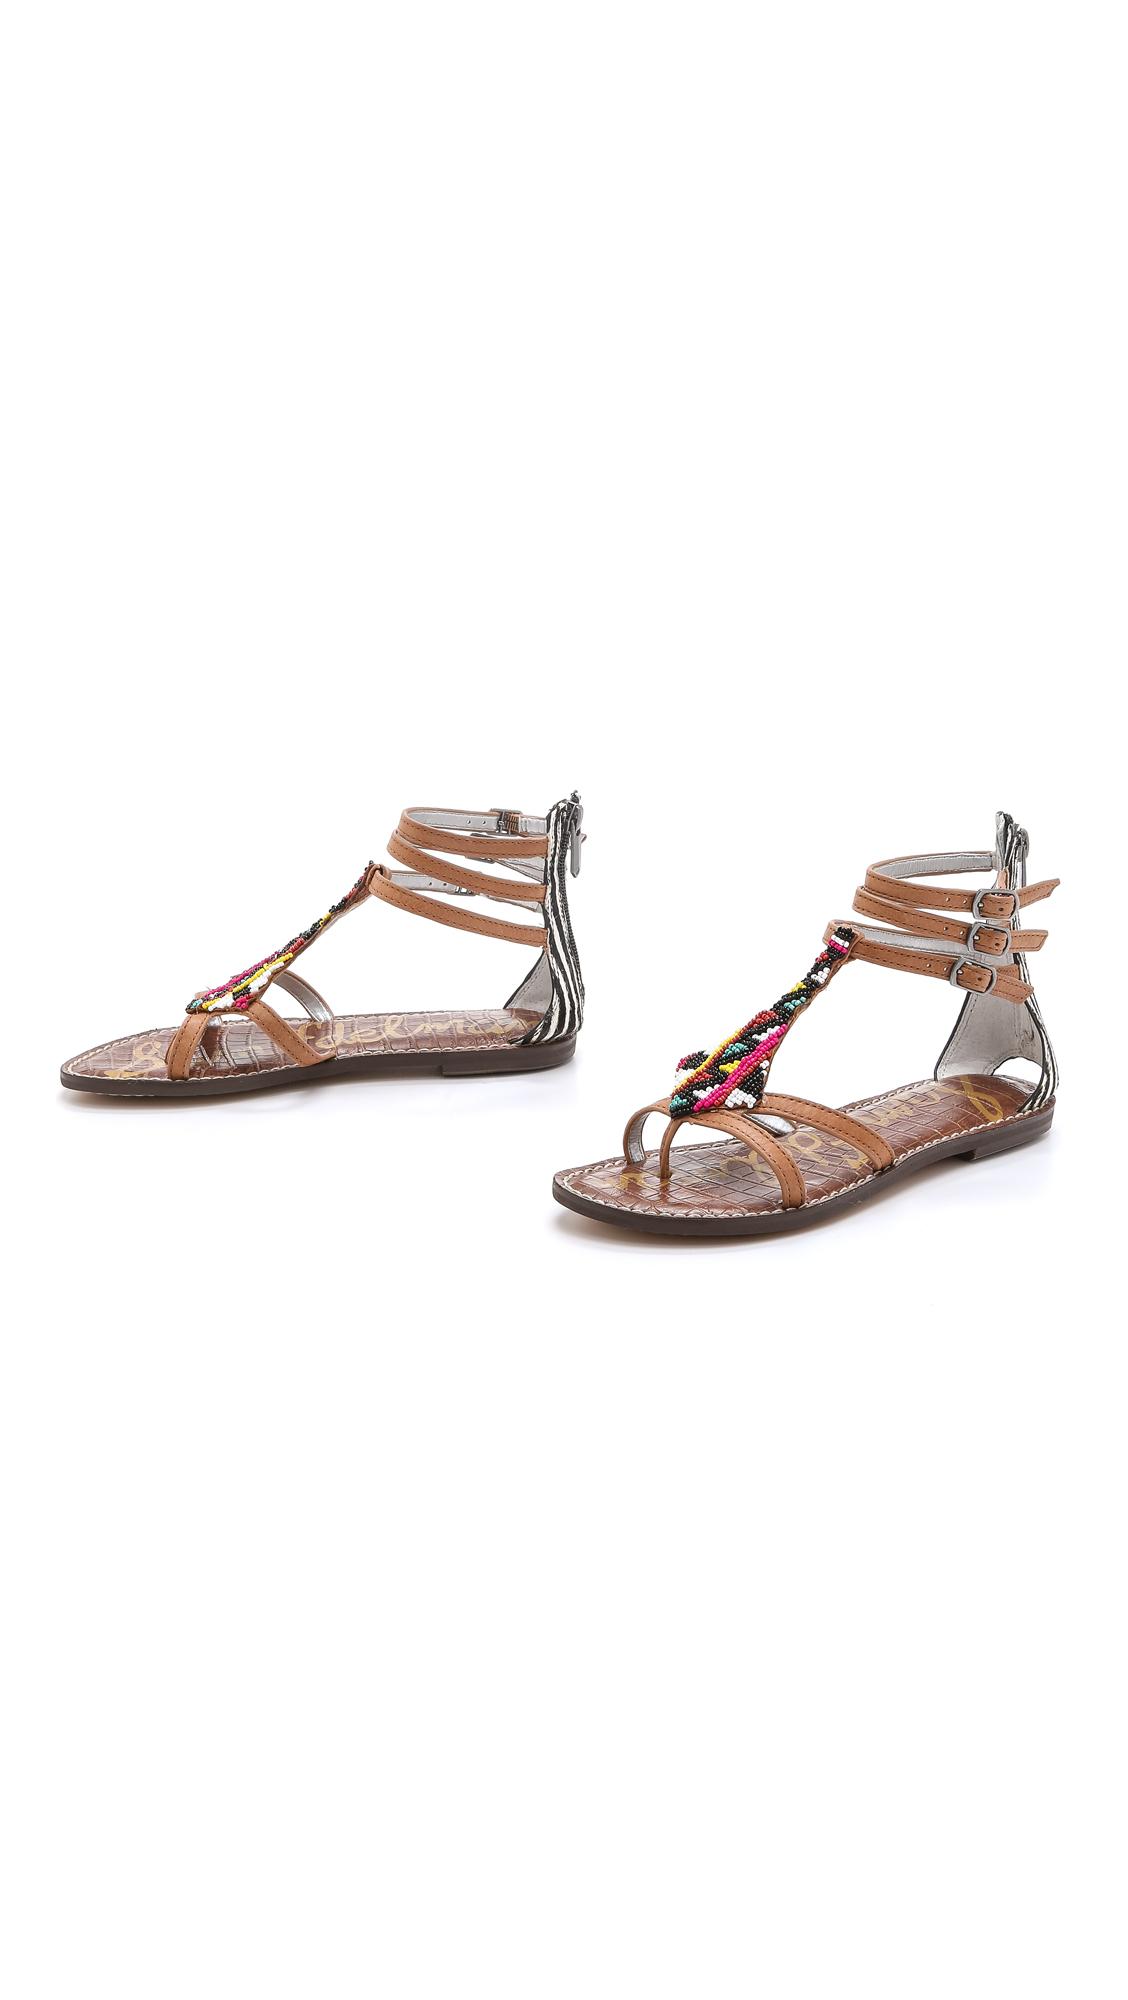 0c150912093ad Lyst - Sam Edelman Giselle Beaded Sandals - Soft Saddle black ivory